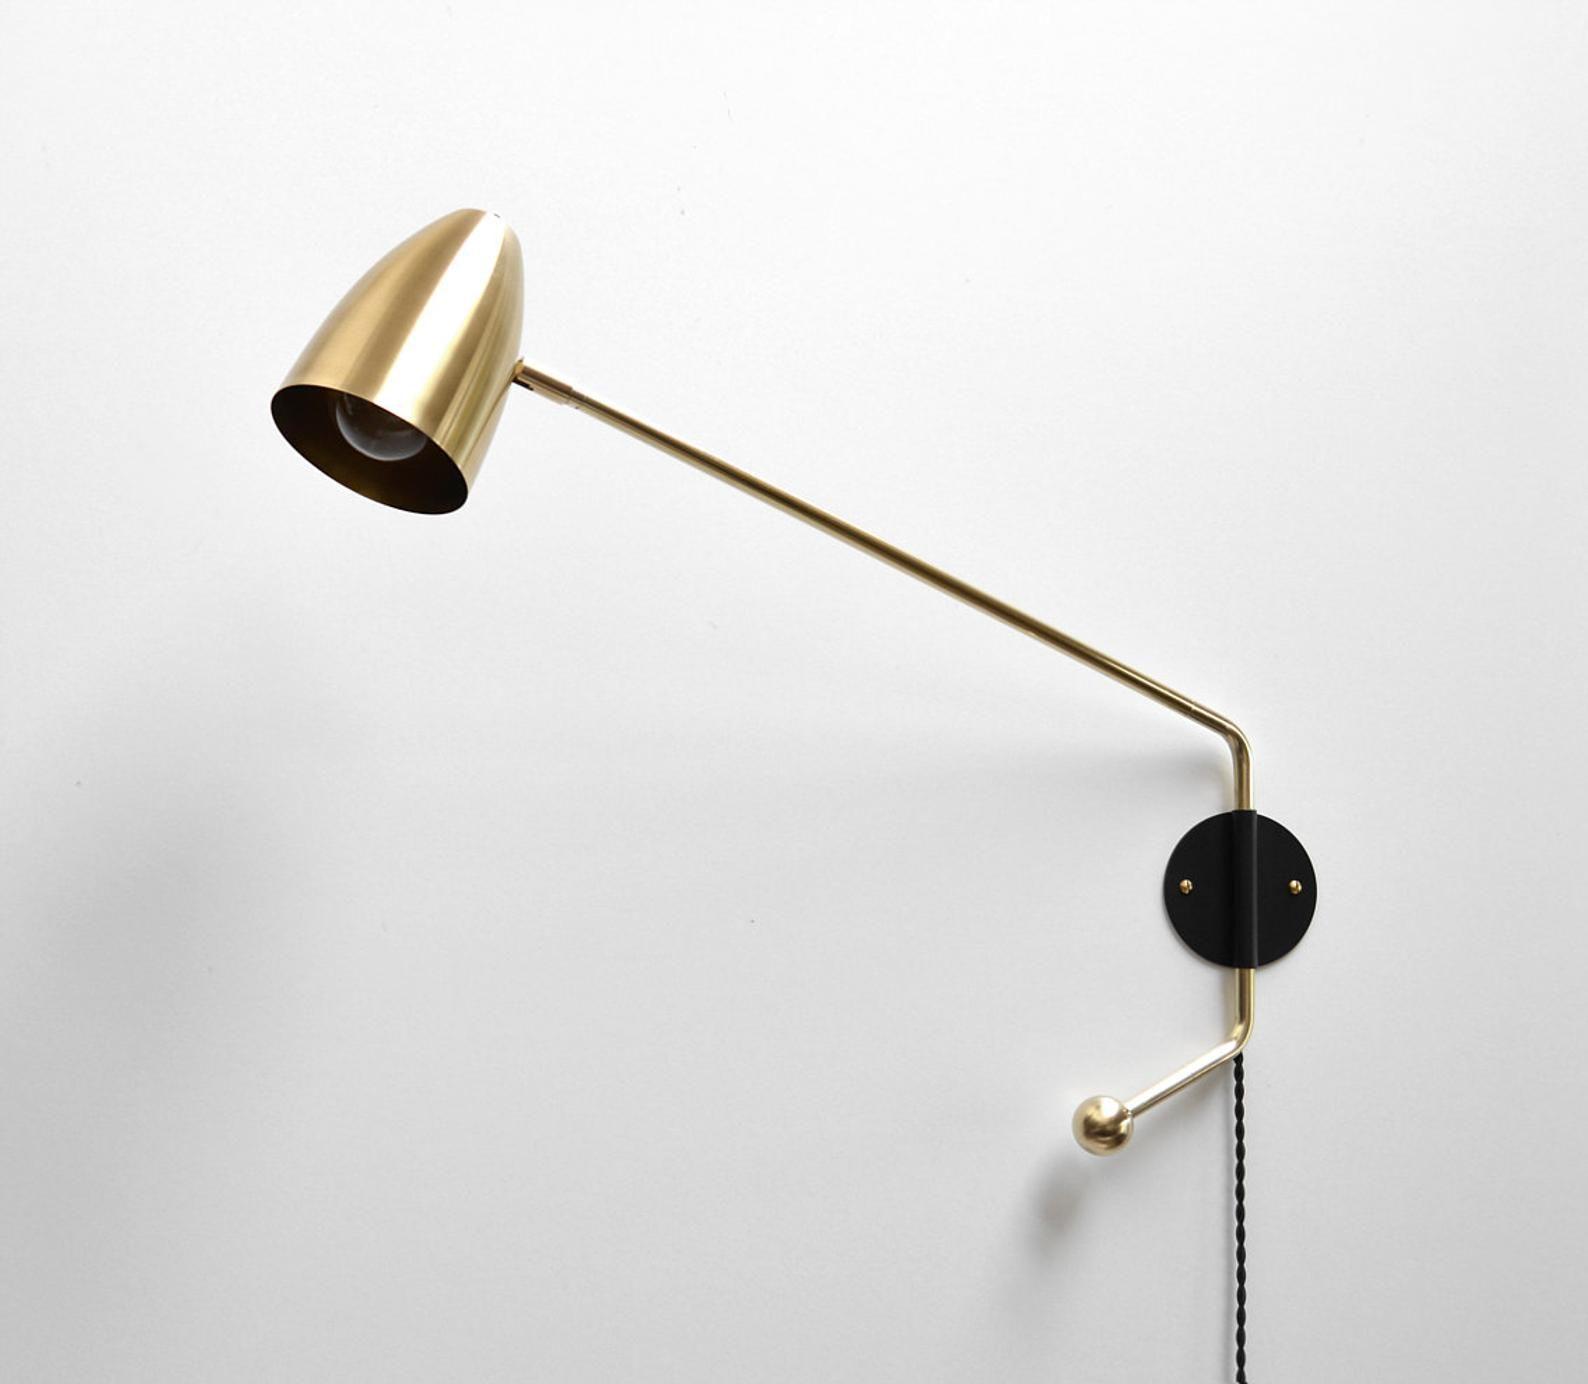 Potence Lamp Modern Brass Swing Arm Sconce 21 27 32 Or 44 Etsy